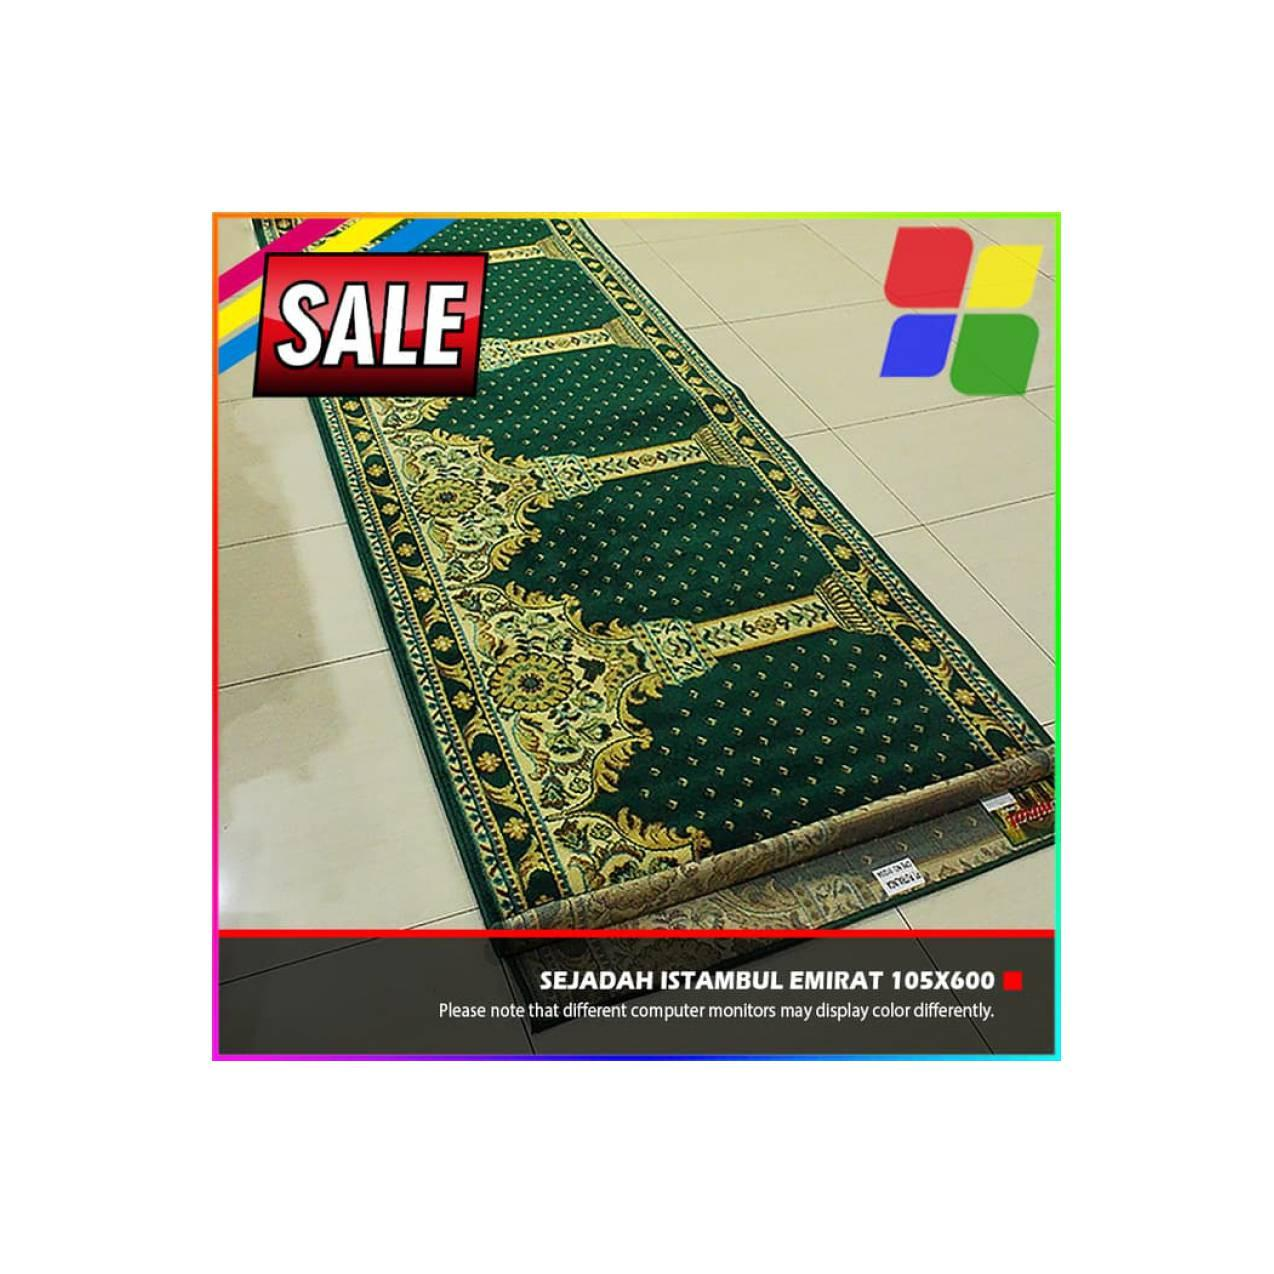 PROMO Sajadah Karpet Msjid Mushola Import Istambul Emirat 105x600cm